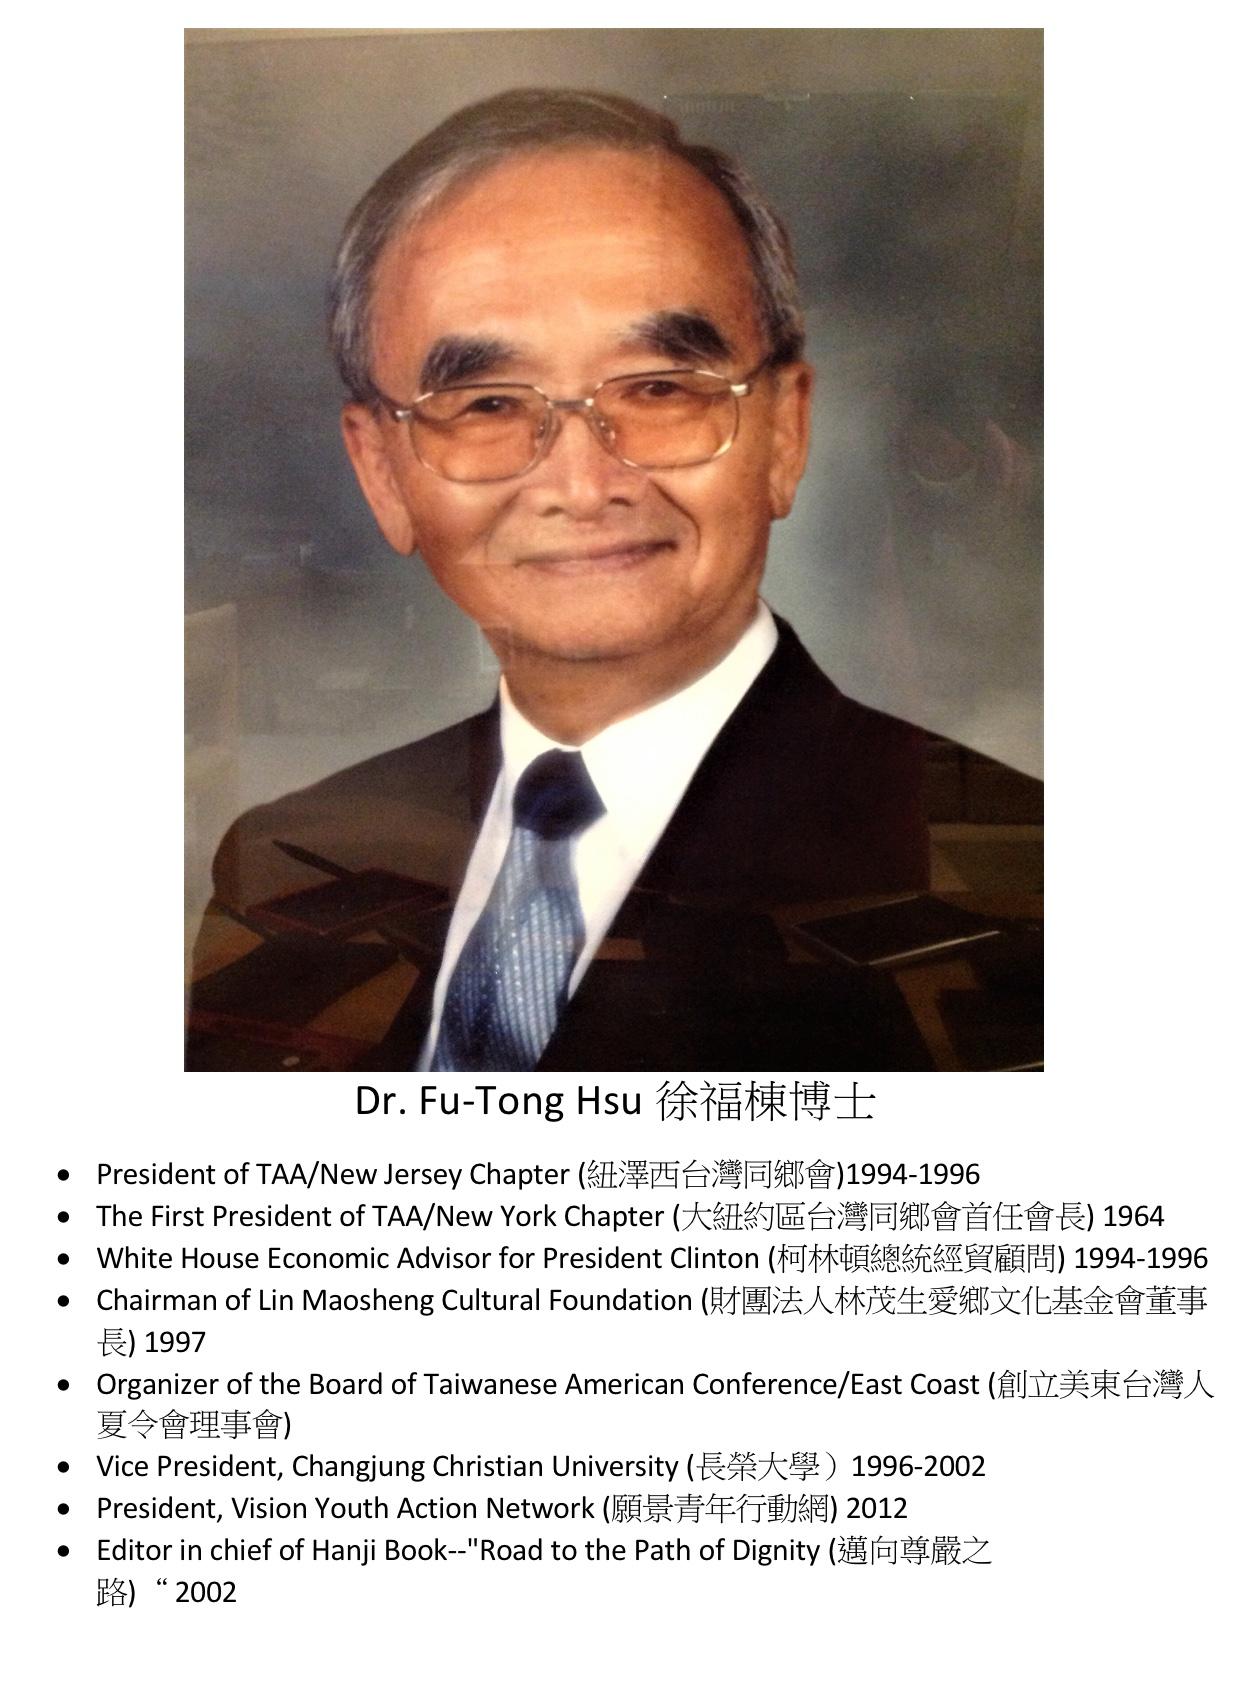 251. Dr. Fu-Tong Hsu 徐福棟博士